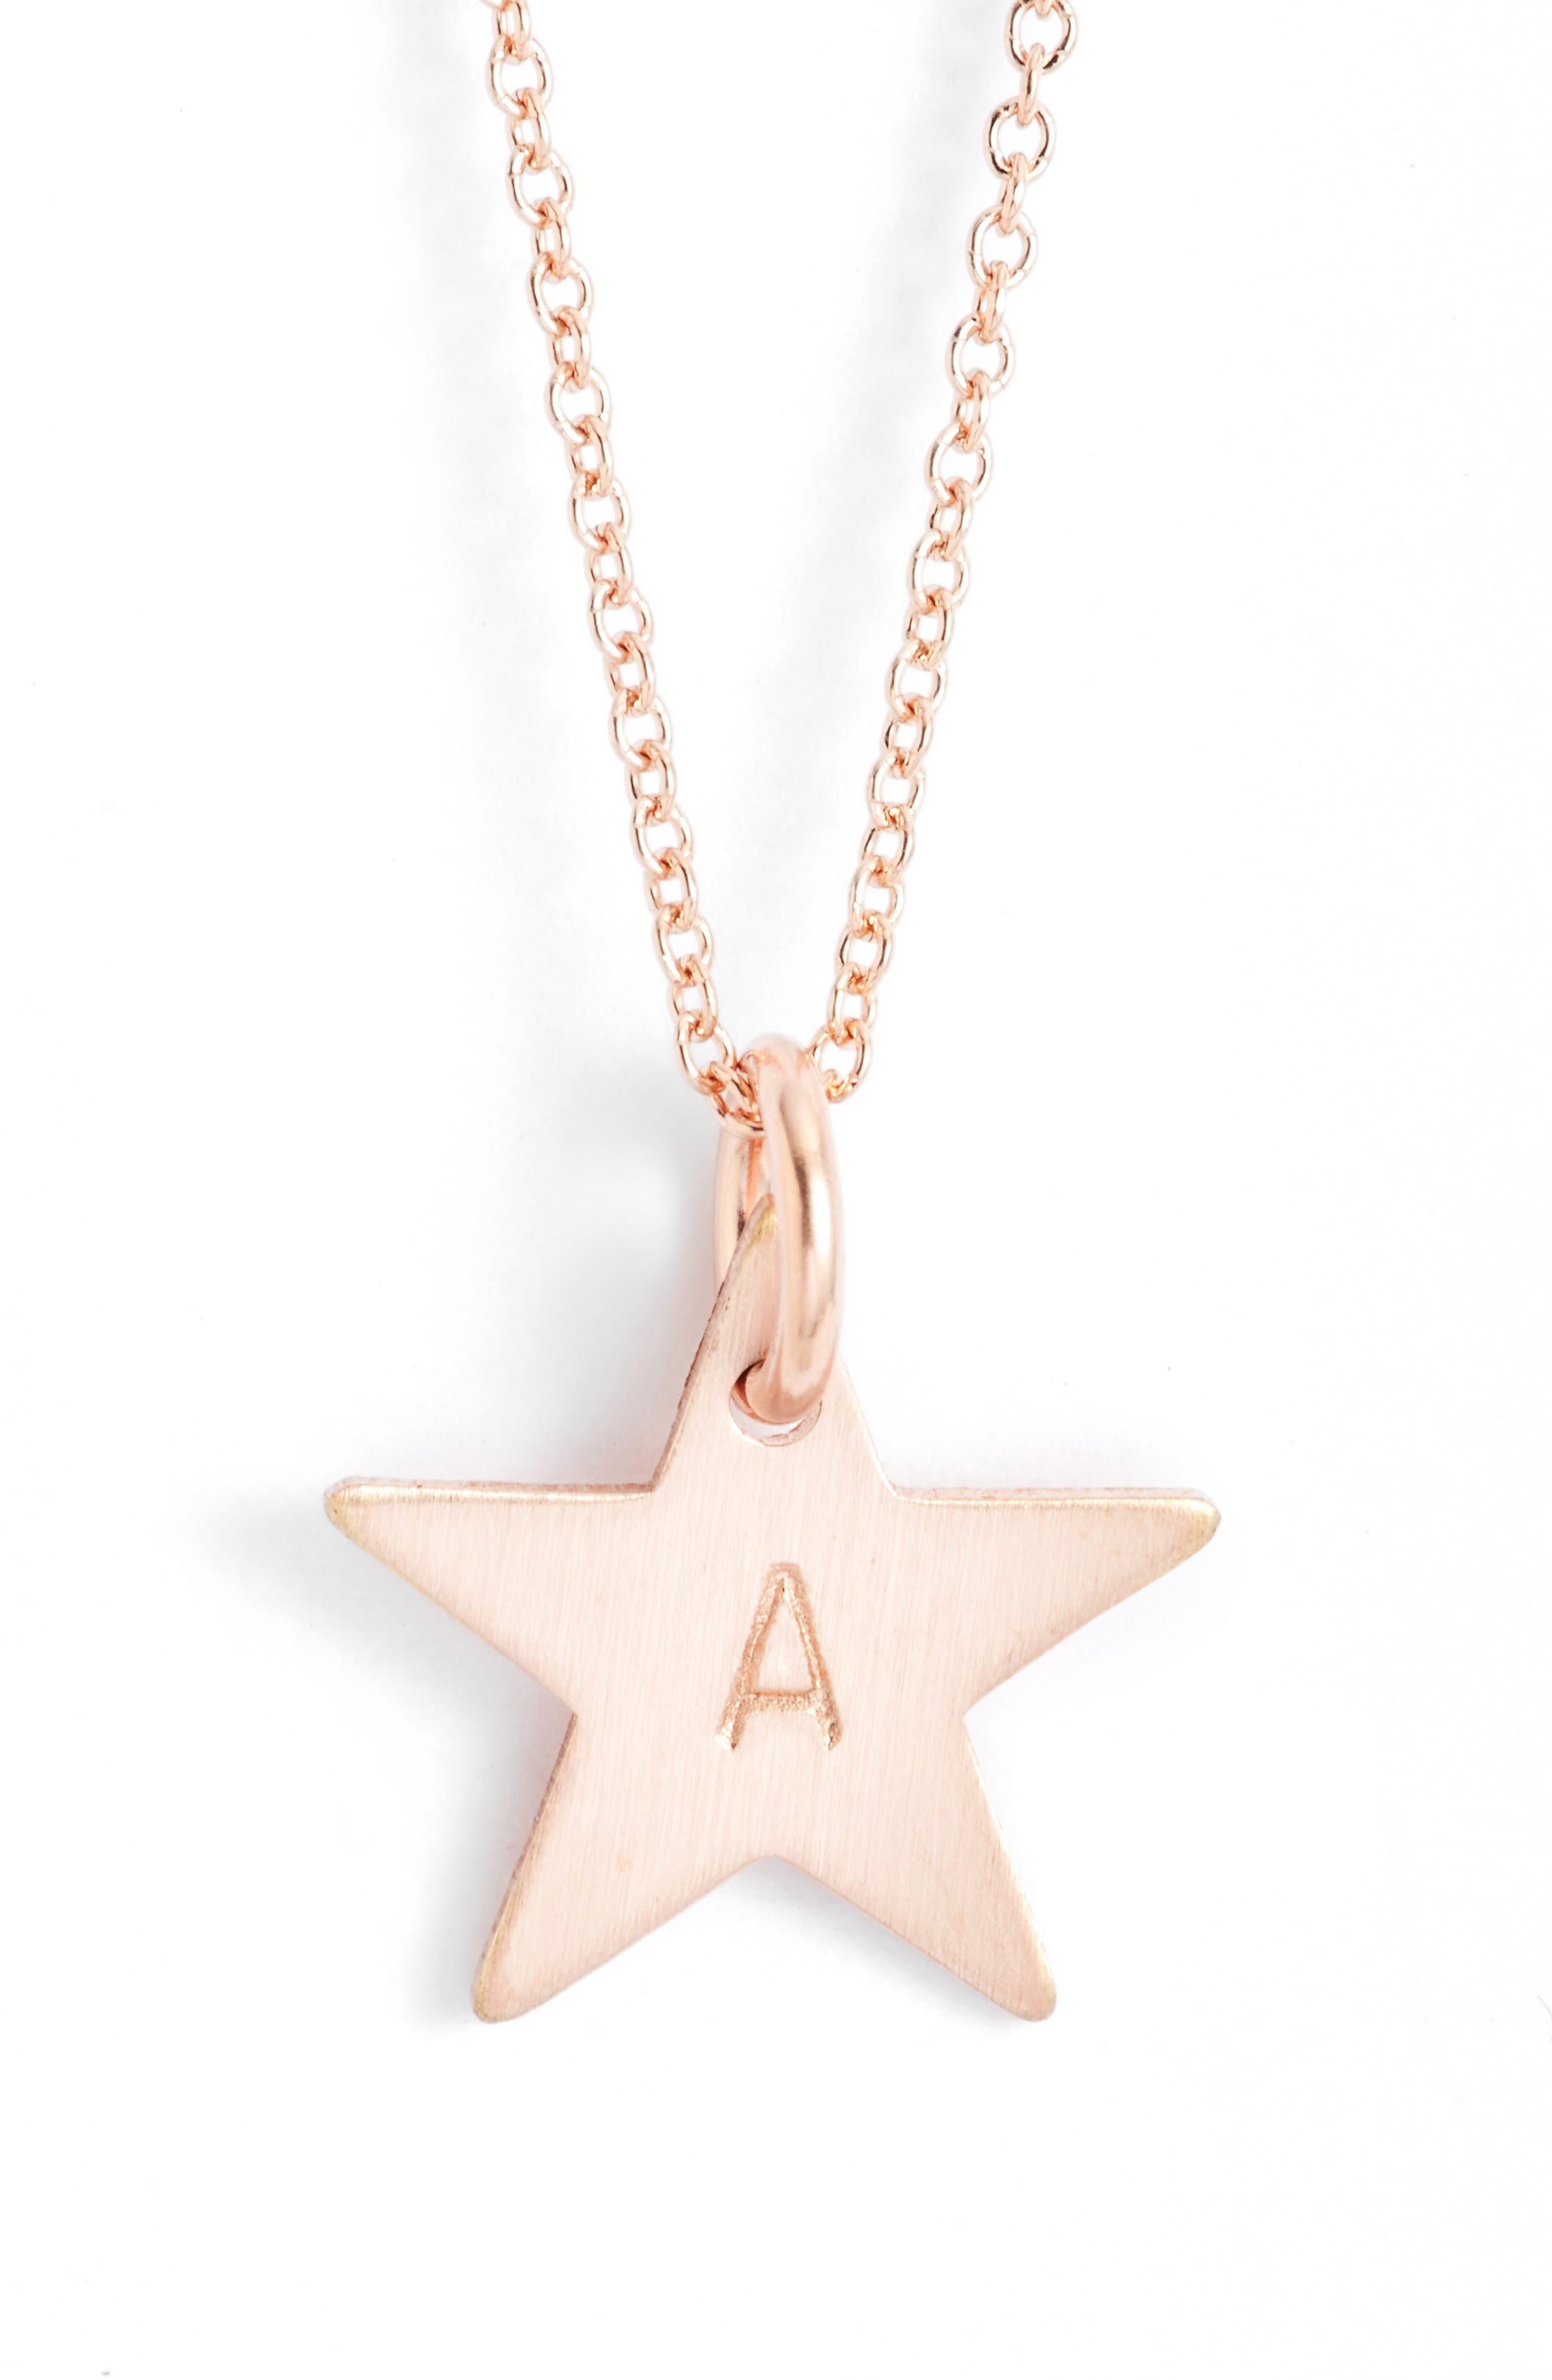 Main Image - Nashelle 14k-Rose Gold Fill Initial Mini Star Pendant Necklace